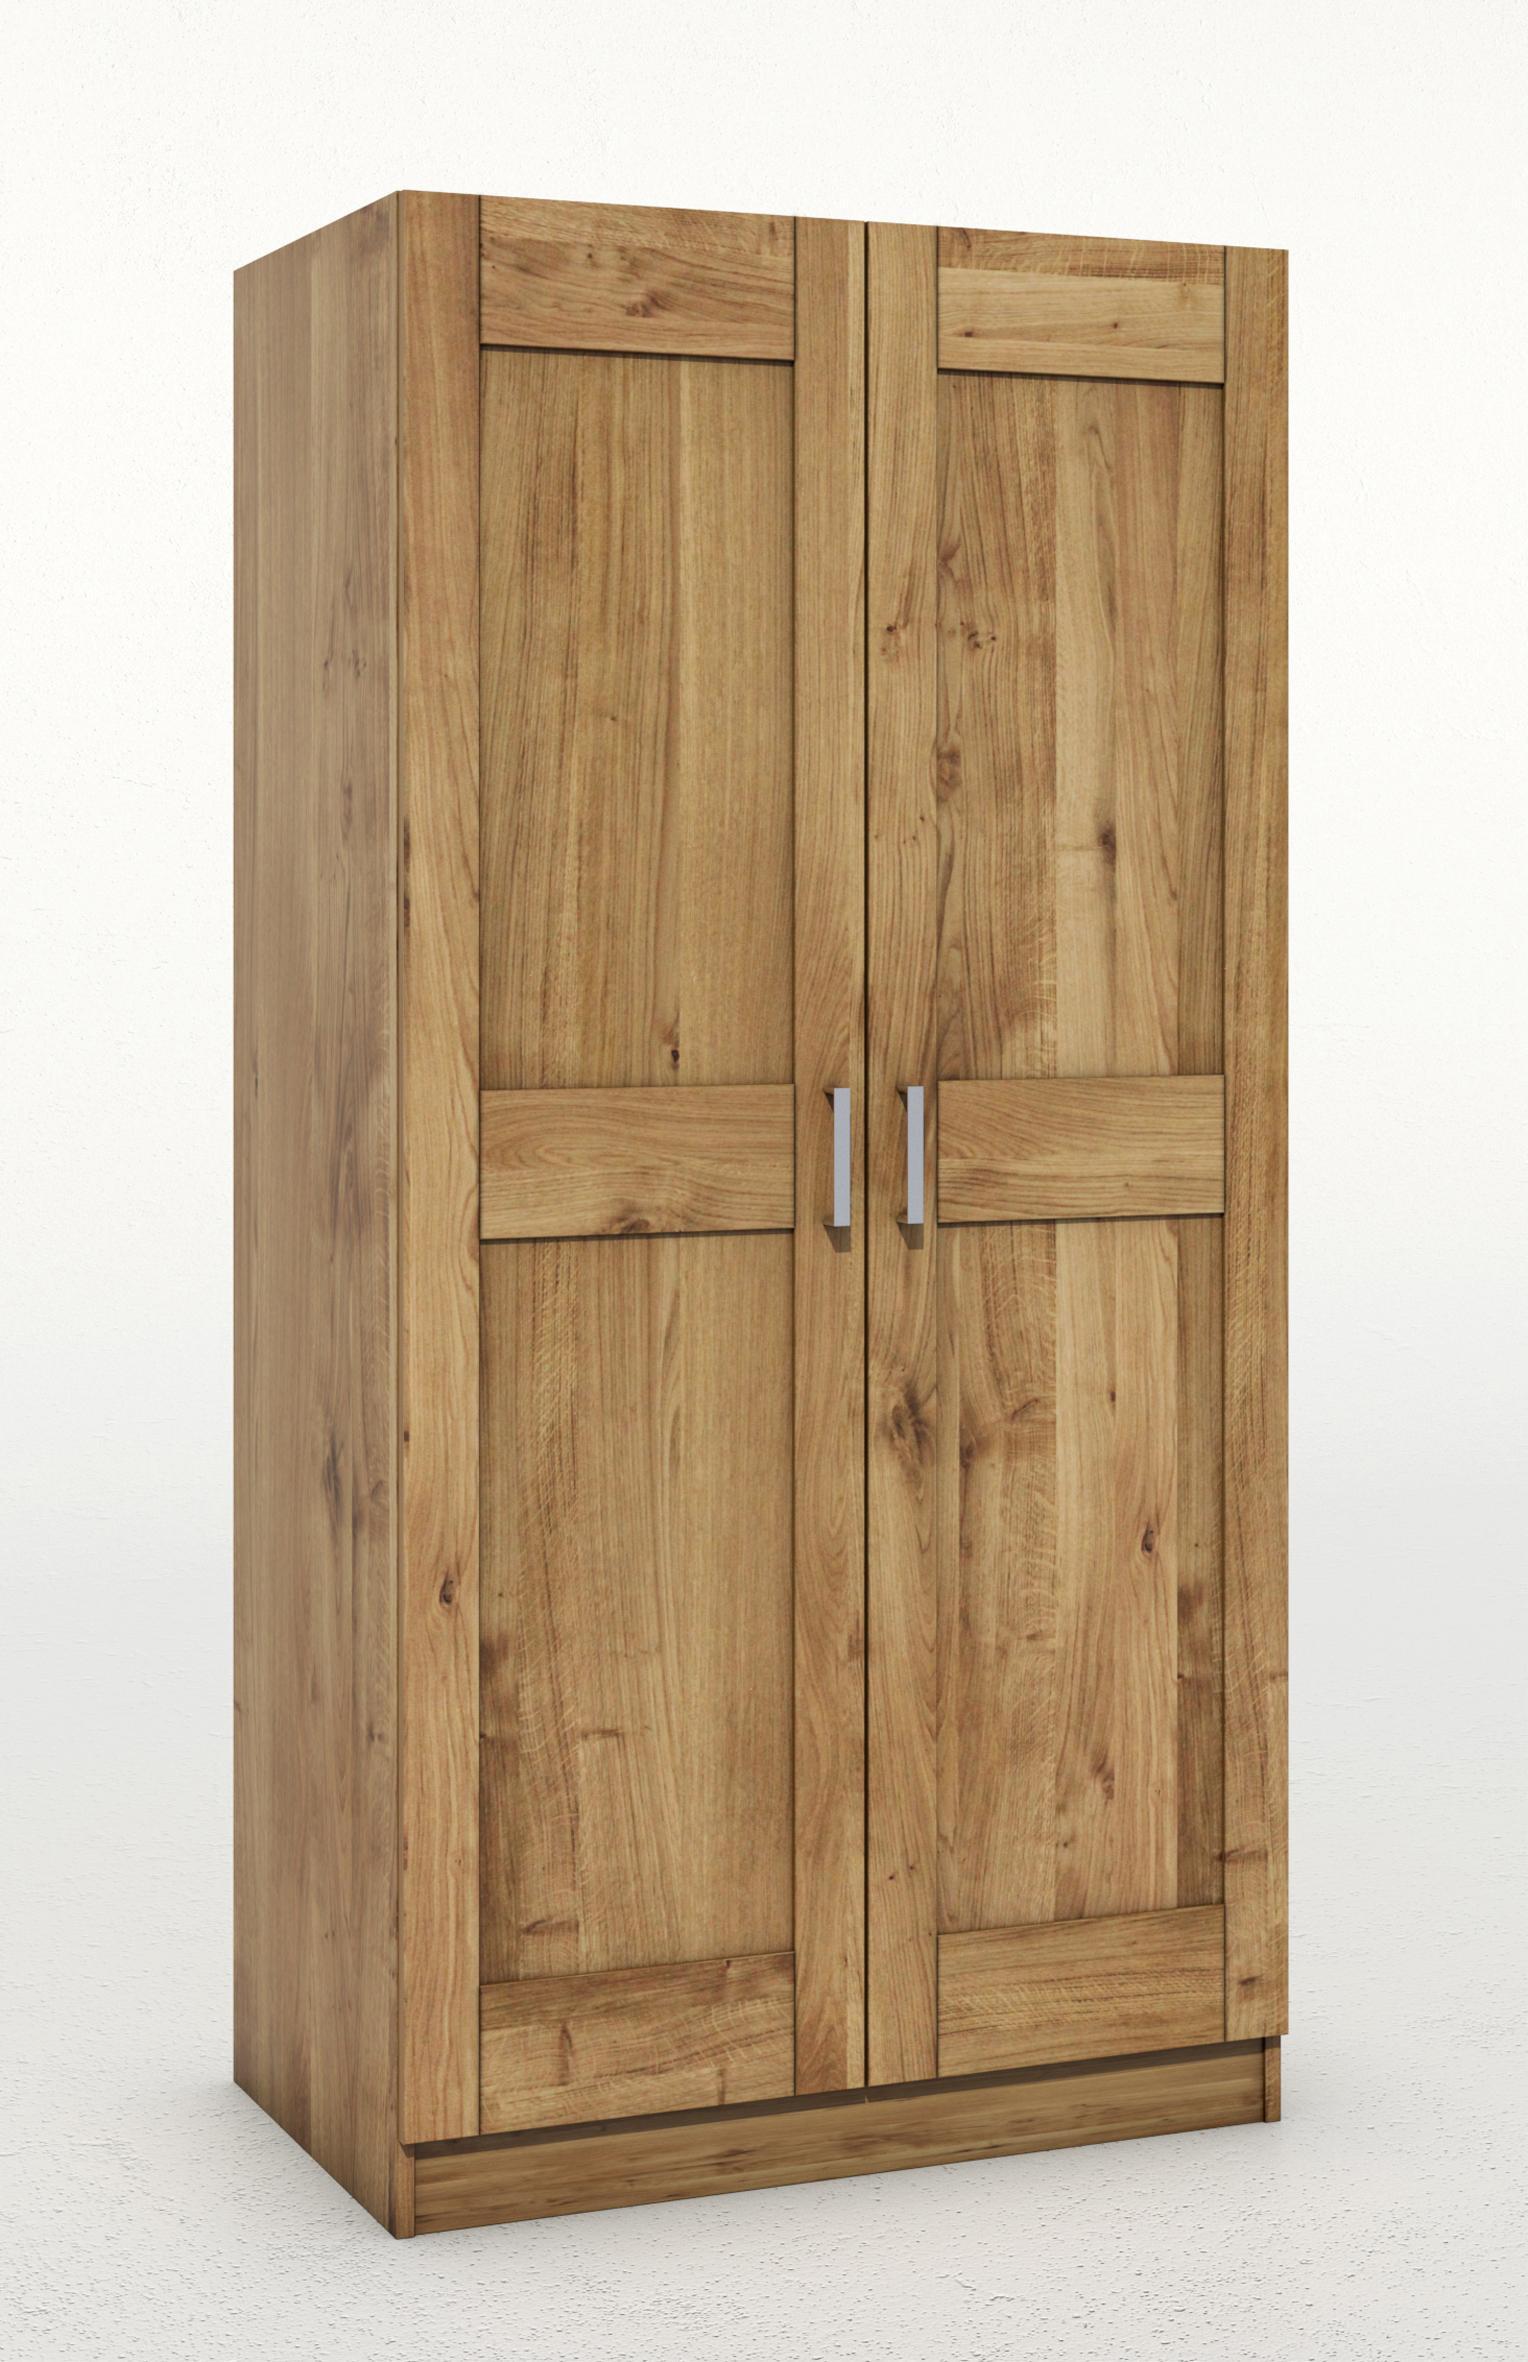 Kleiderschrank toni tommy Türig wildeiche teilmassiv massivholz 2türig